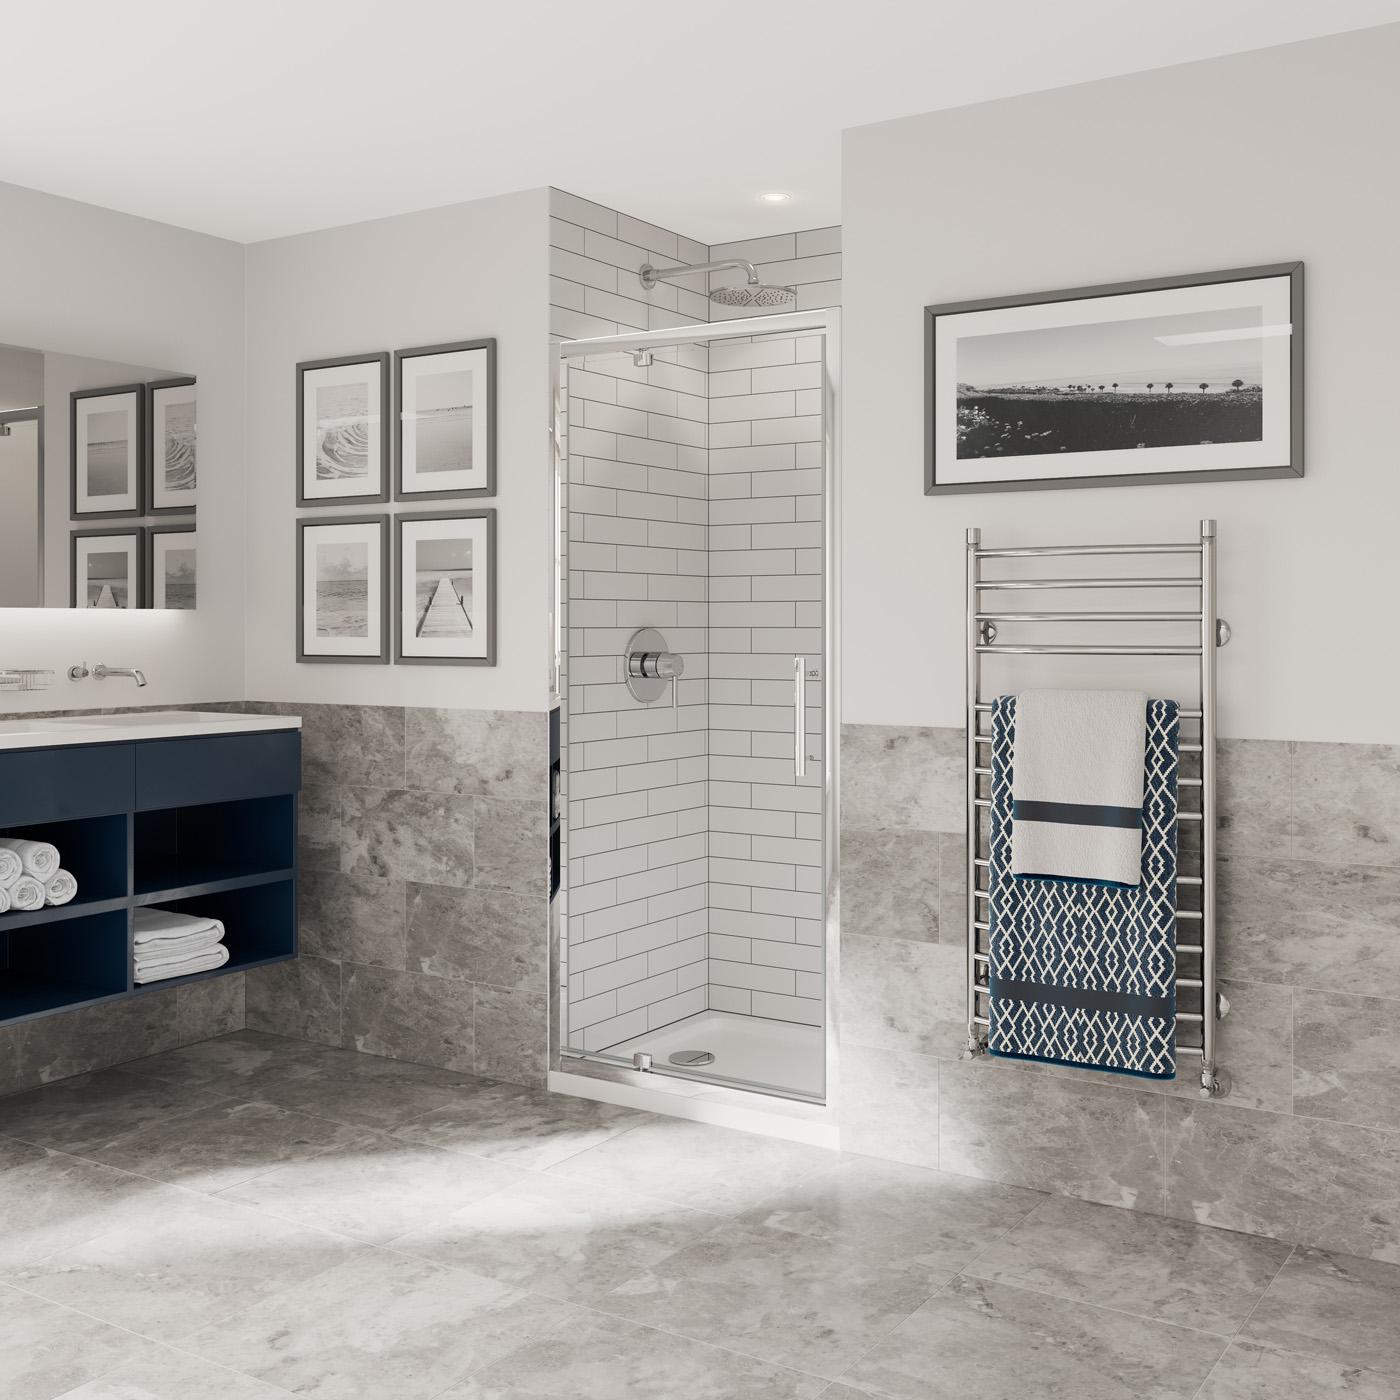 Optima 6 Pivot Door Chrome Shower Enclosure Coram Showers